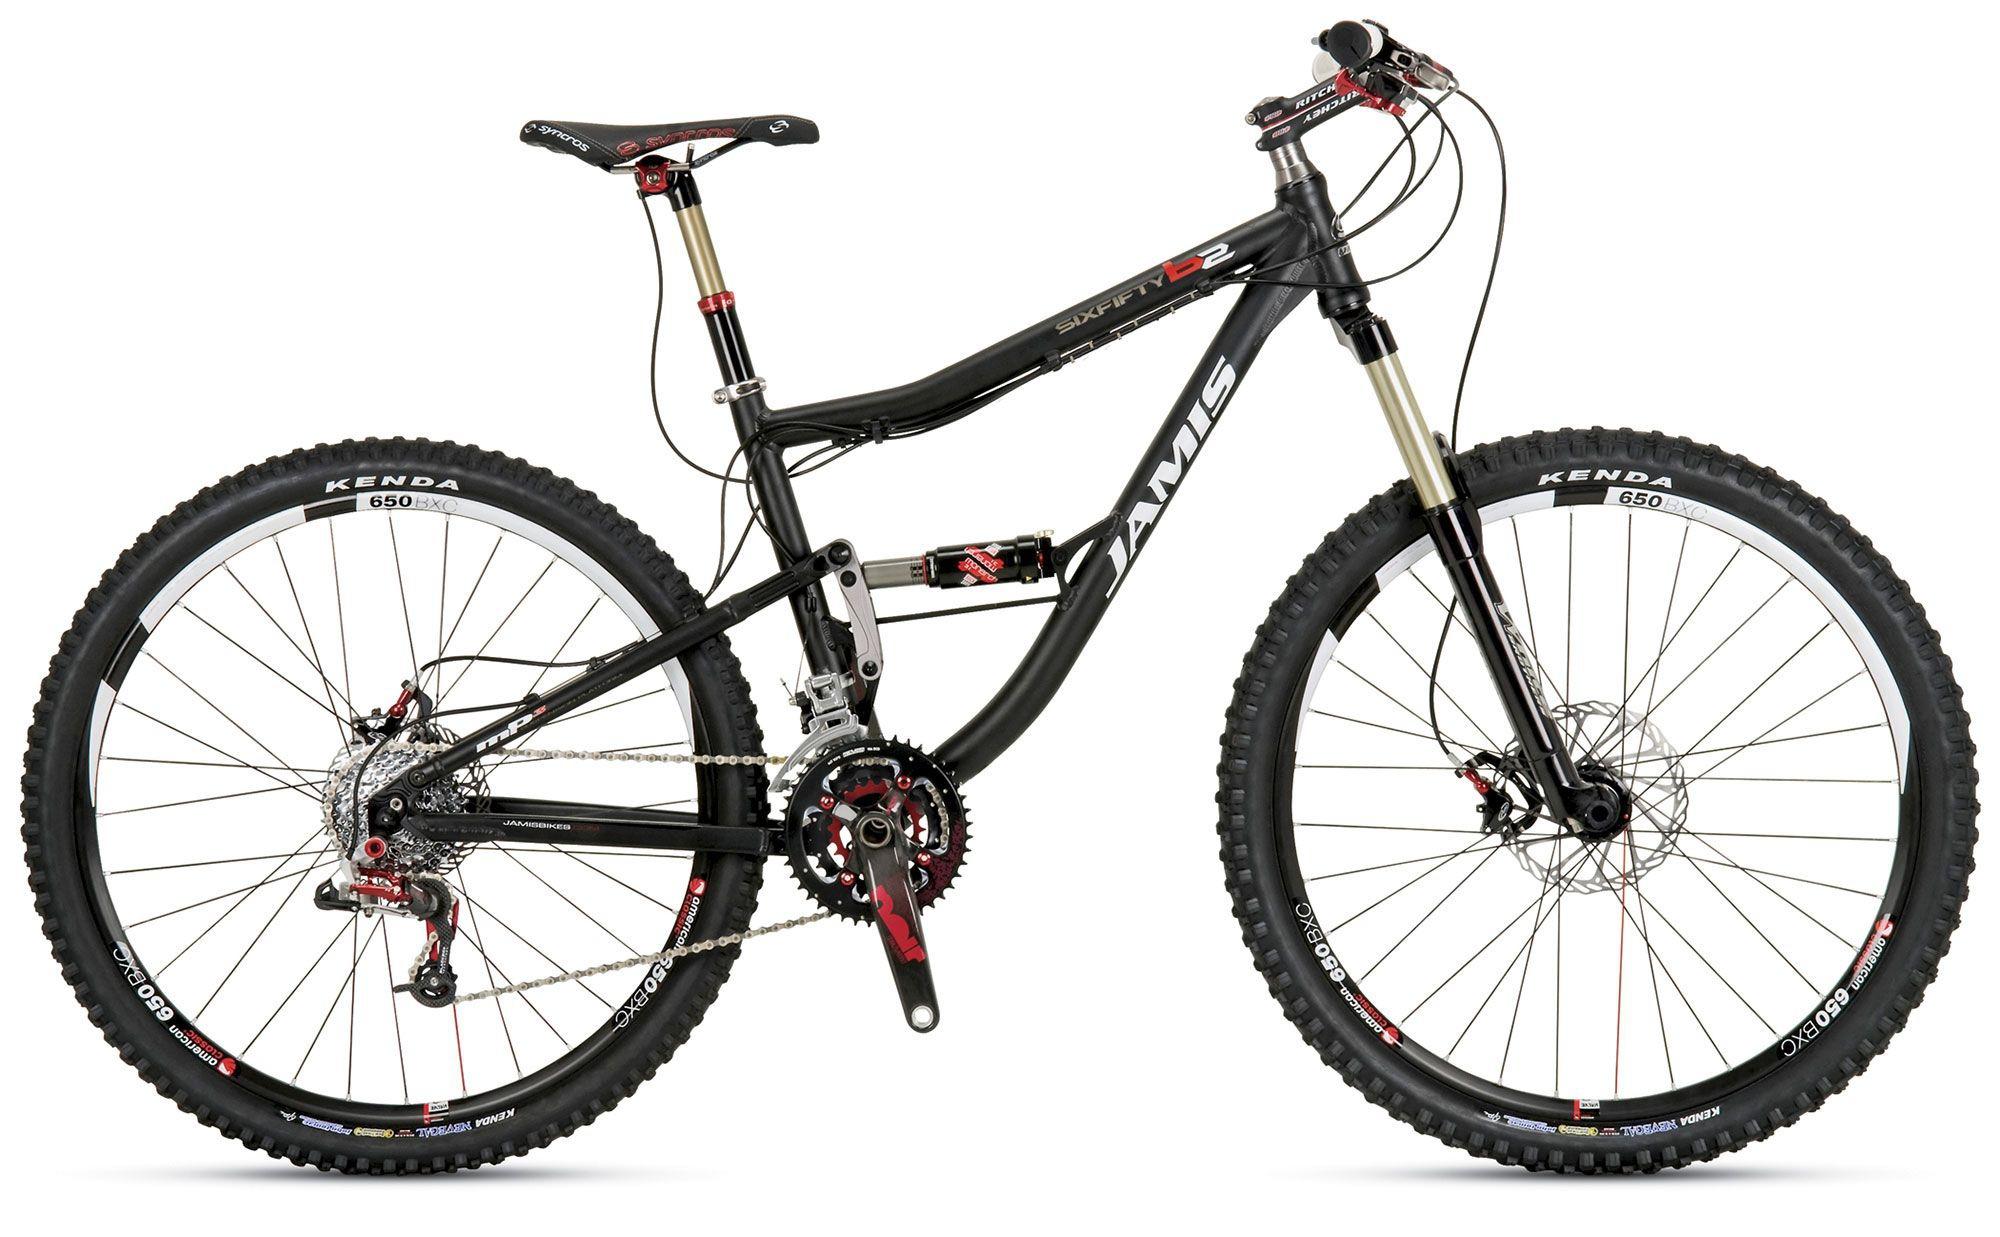 Jamis Dakar Sixfifty B2